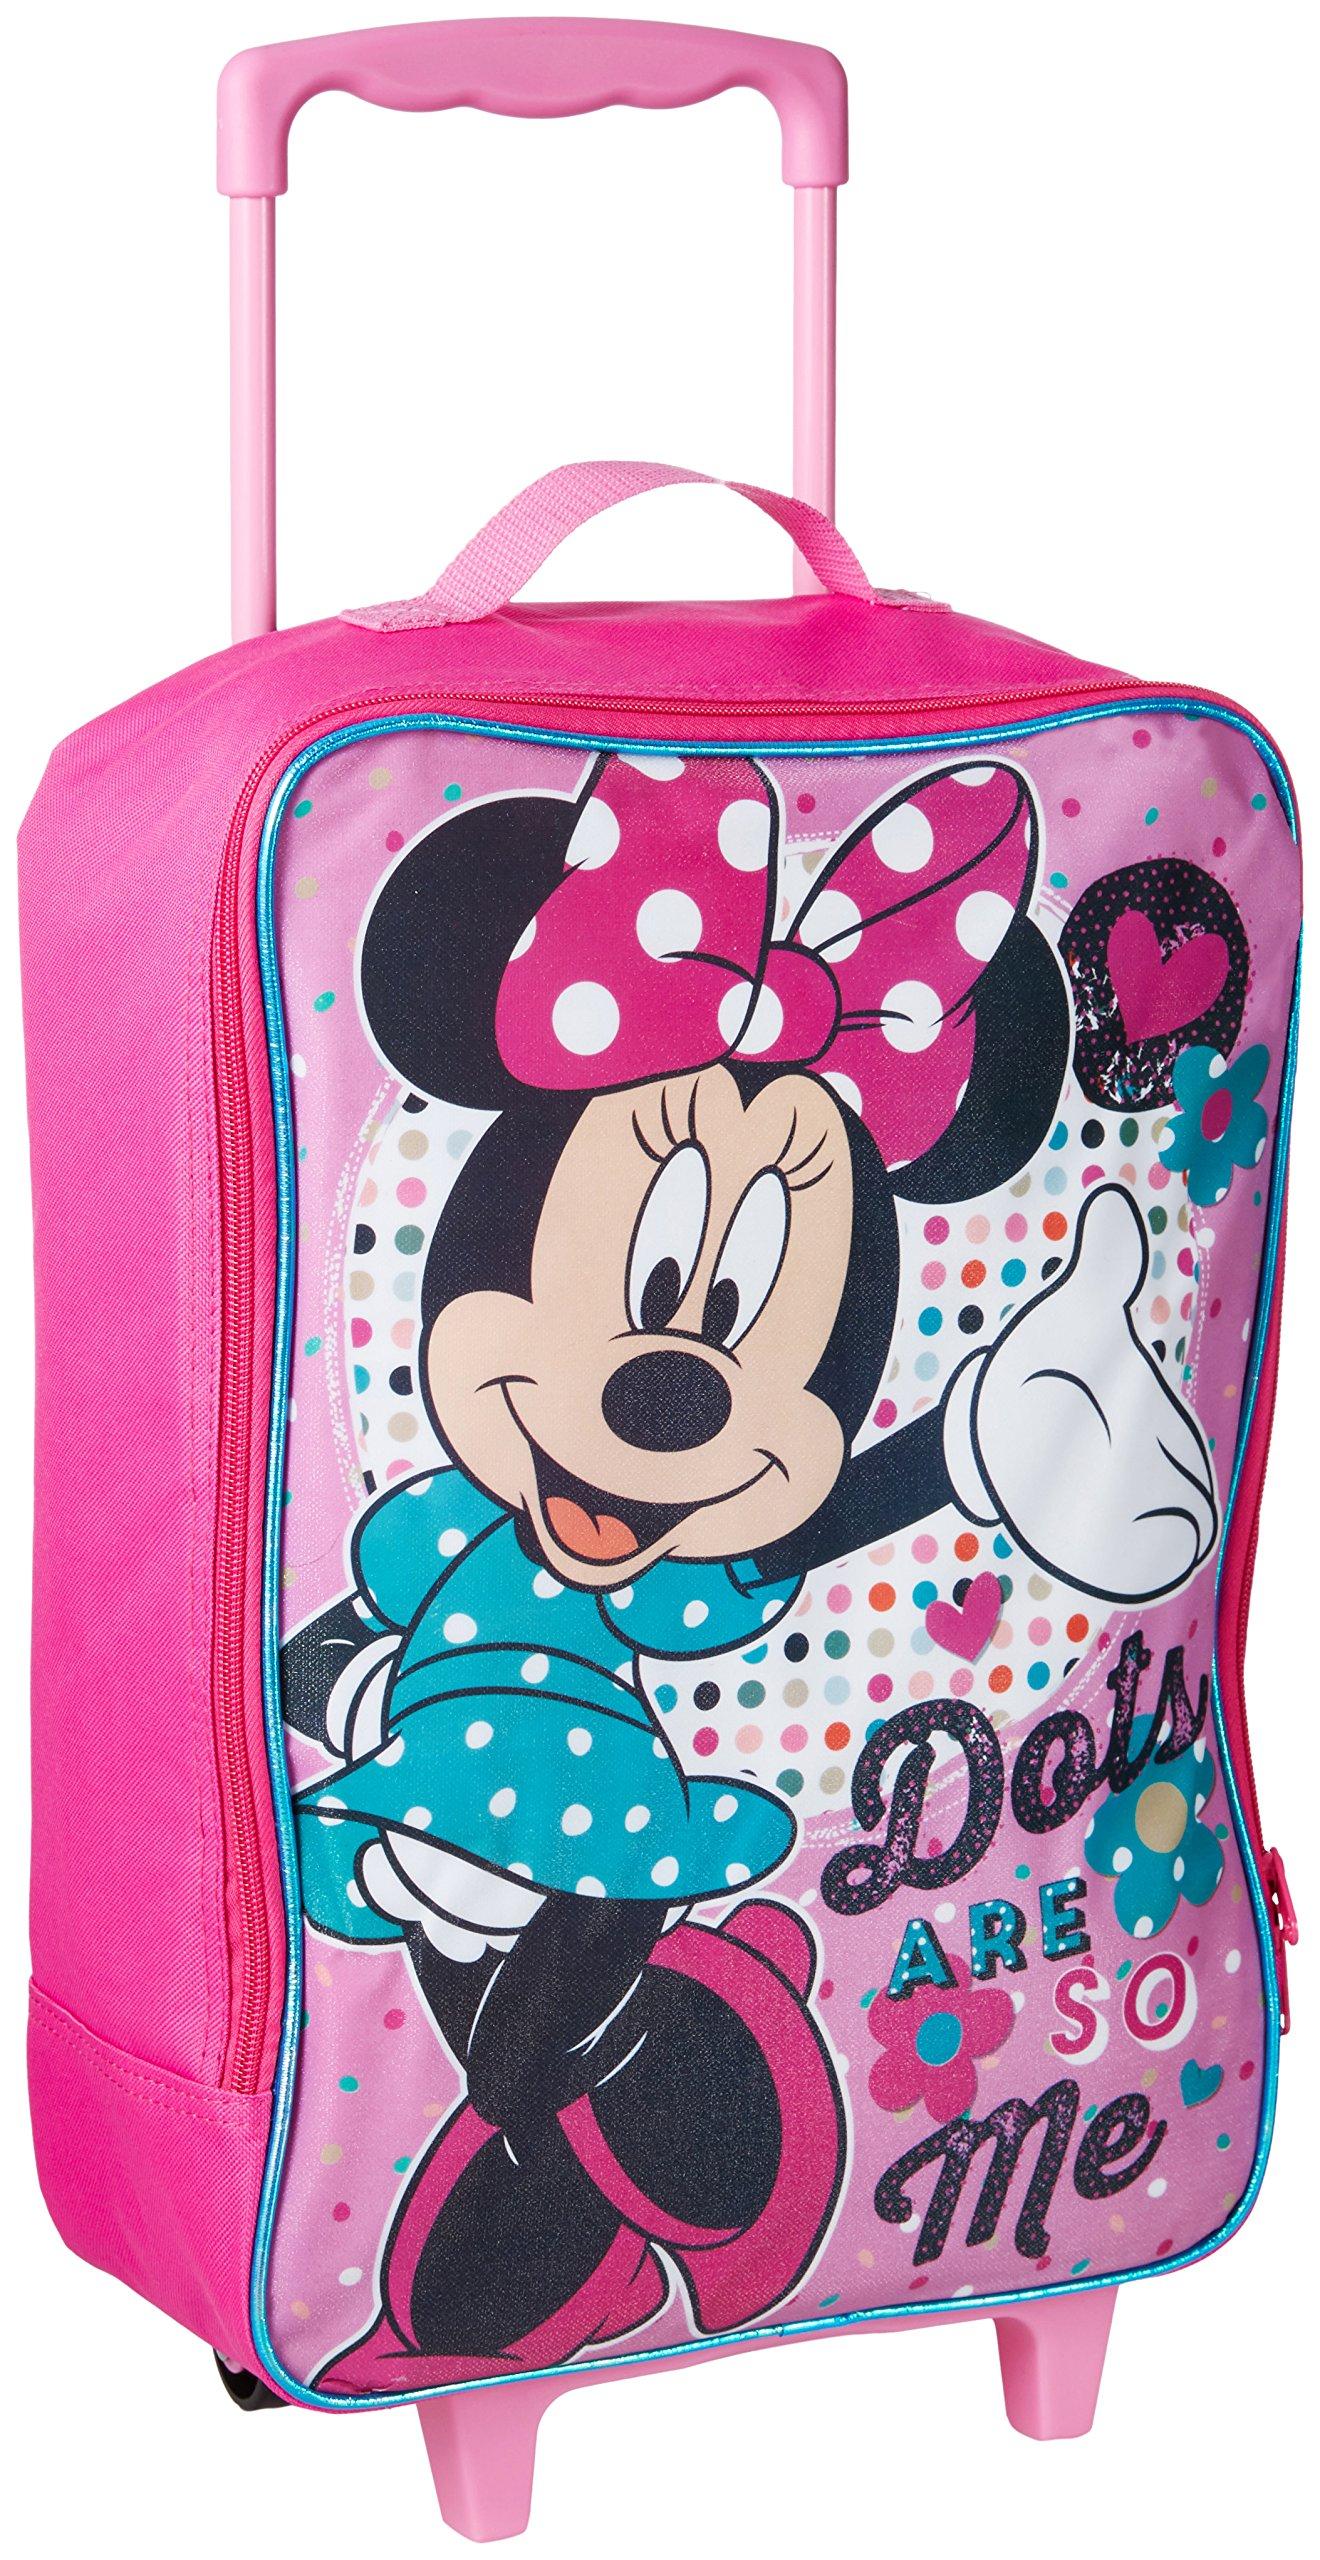 Disney Minnie Mouse Polka Dot Pilot Case, Pink